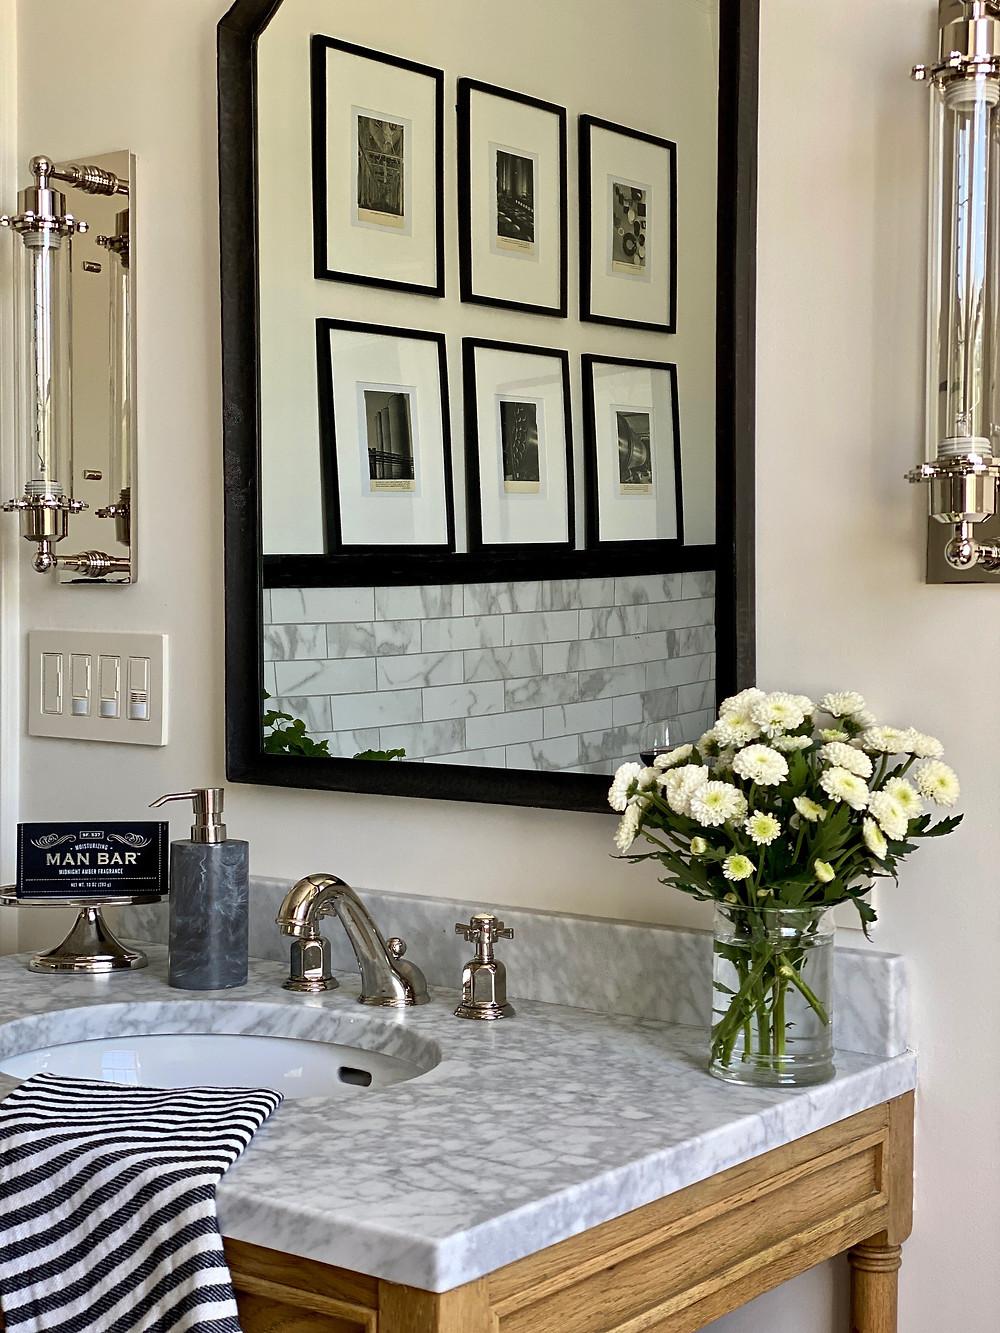 Spa bath, stainless steel bathtub, black and white bathrooms, guest retreat, bathroom design, RH, man bar,